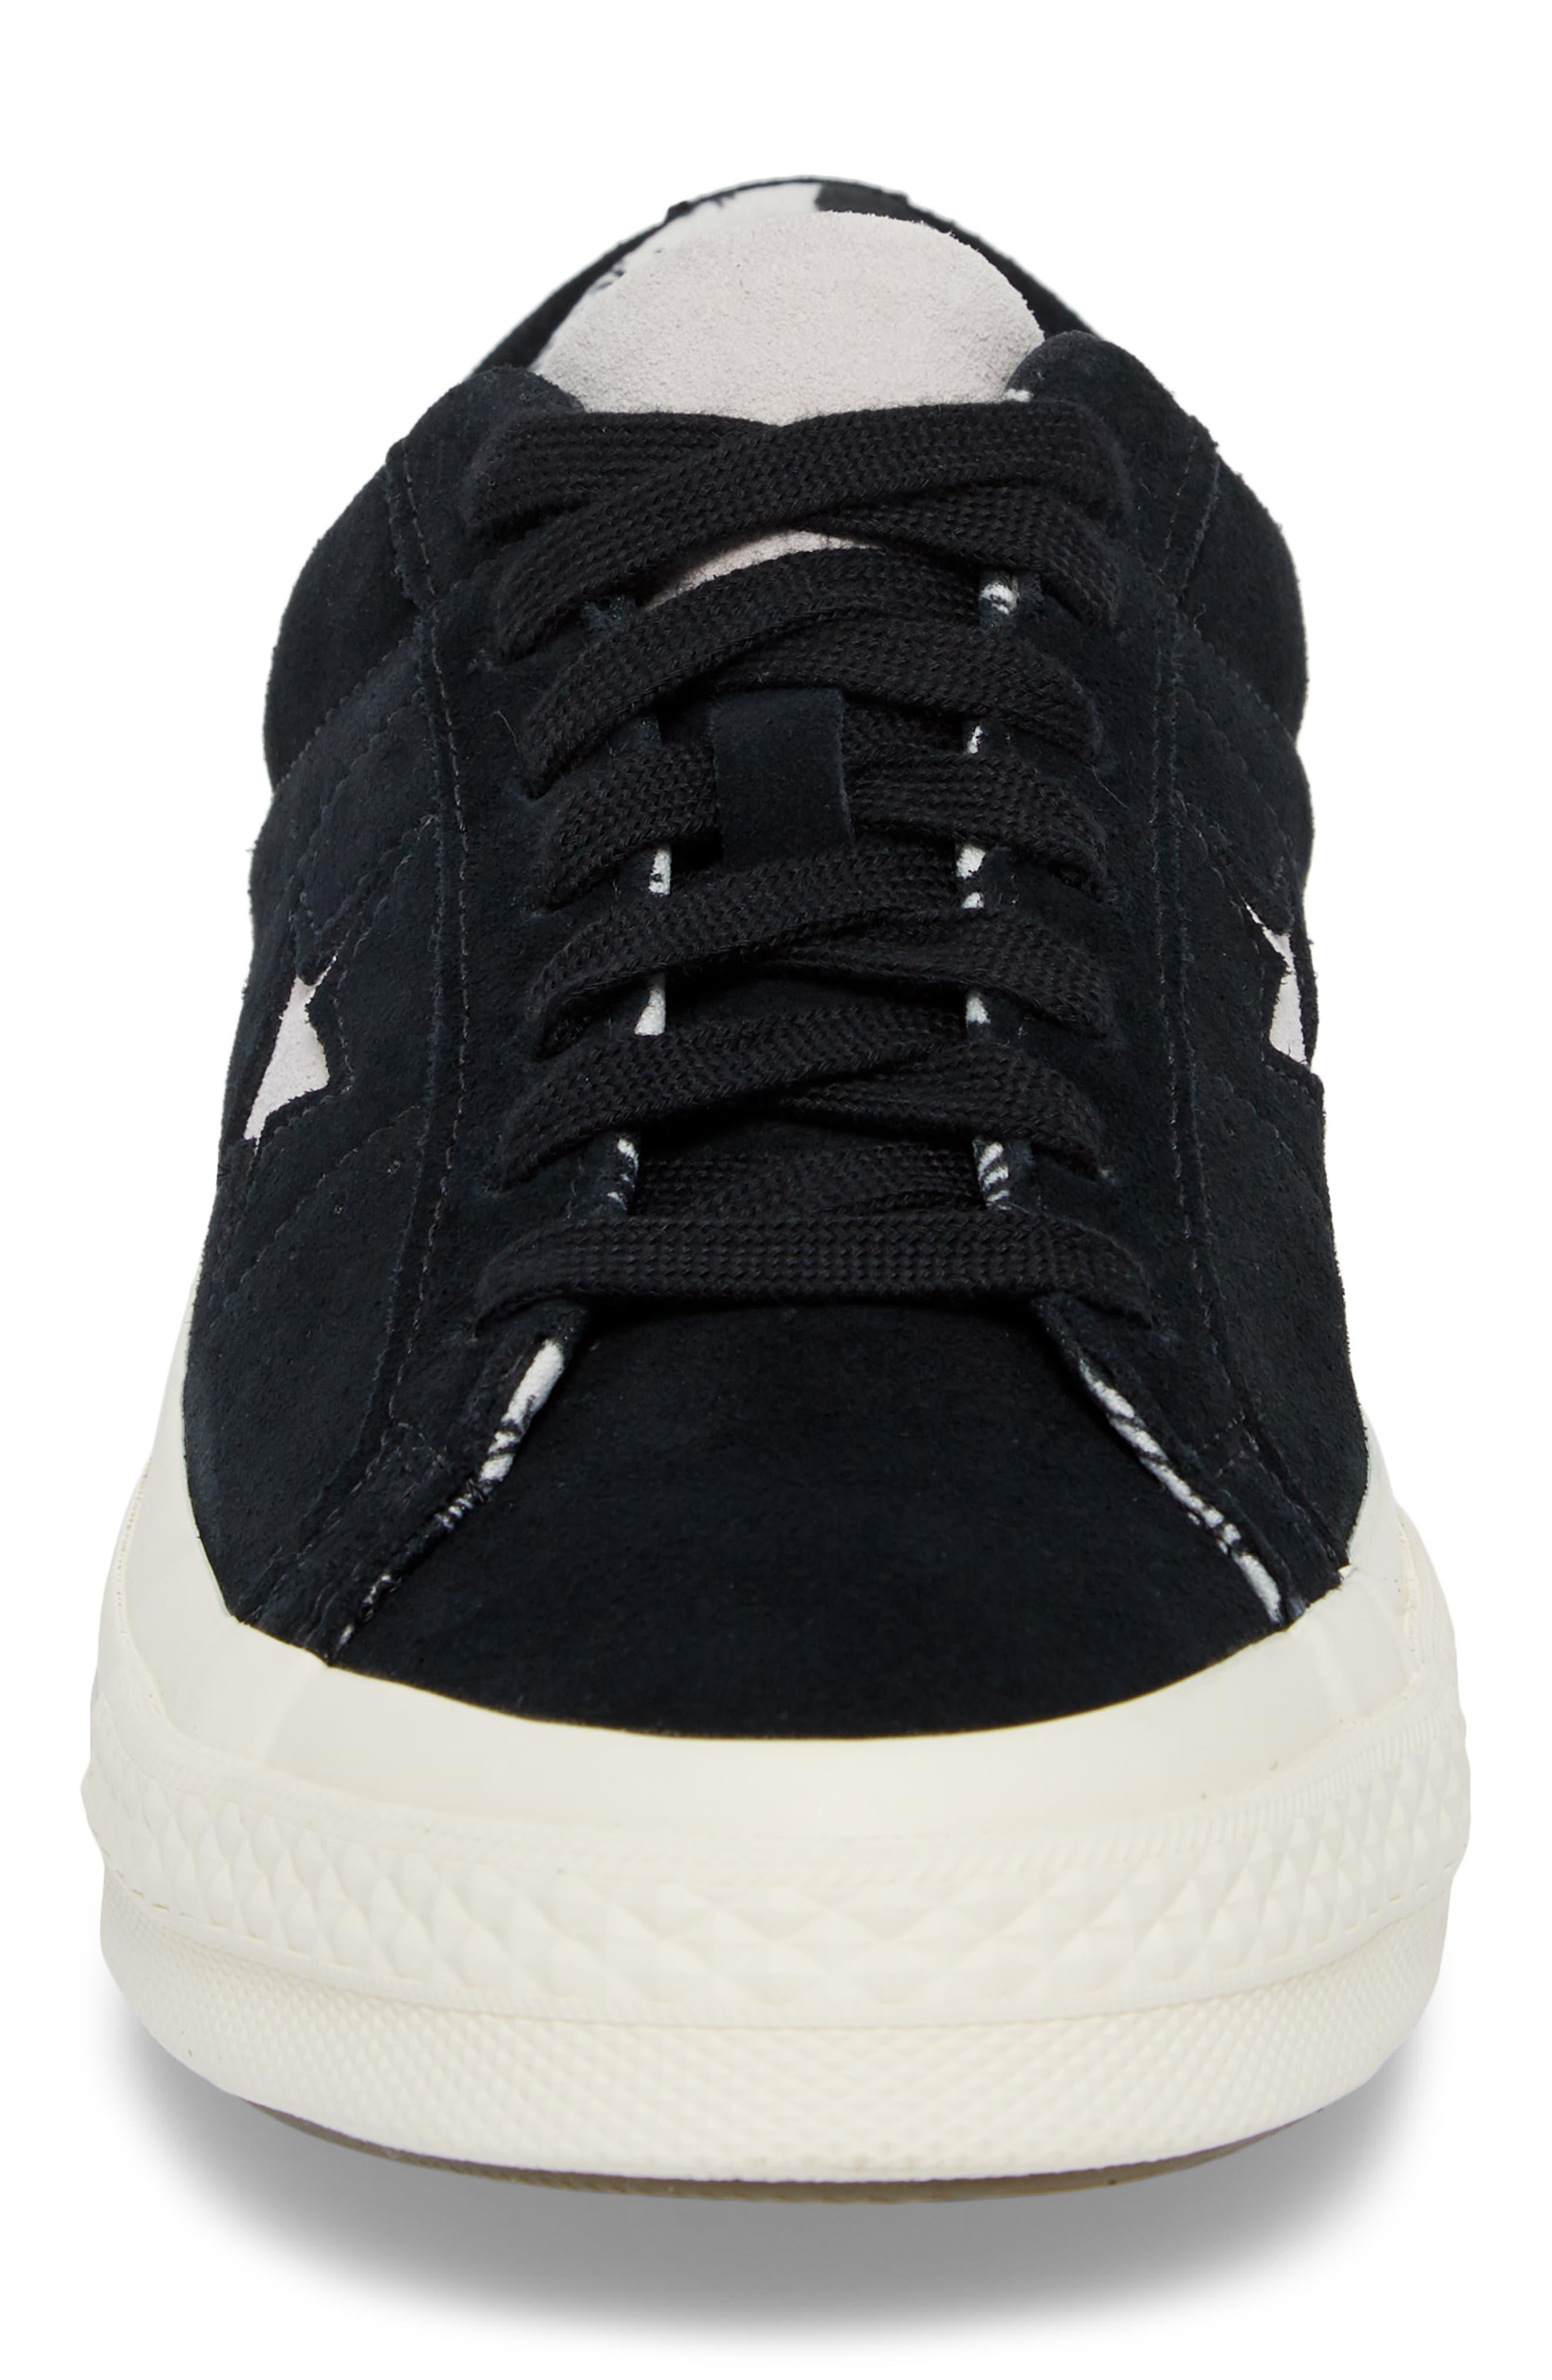 One-Star Tropical Sneaker,                             Alternate thumbnail 4, color,                             001